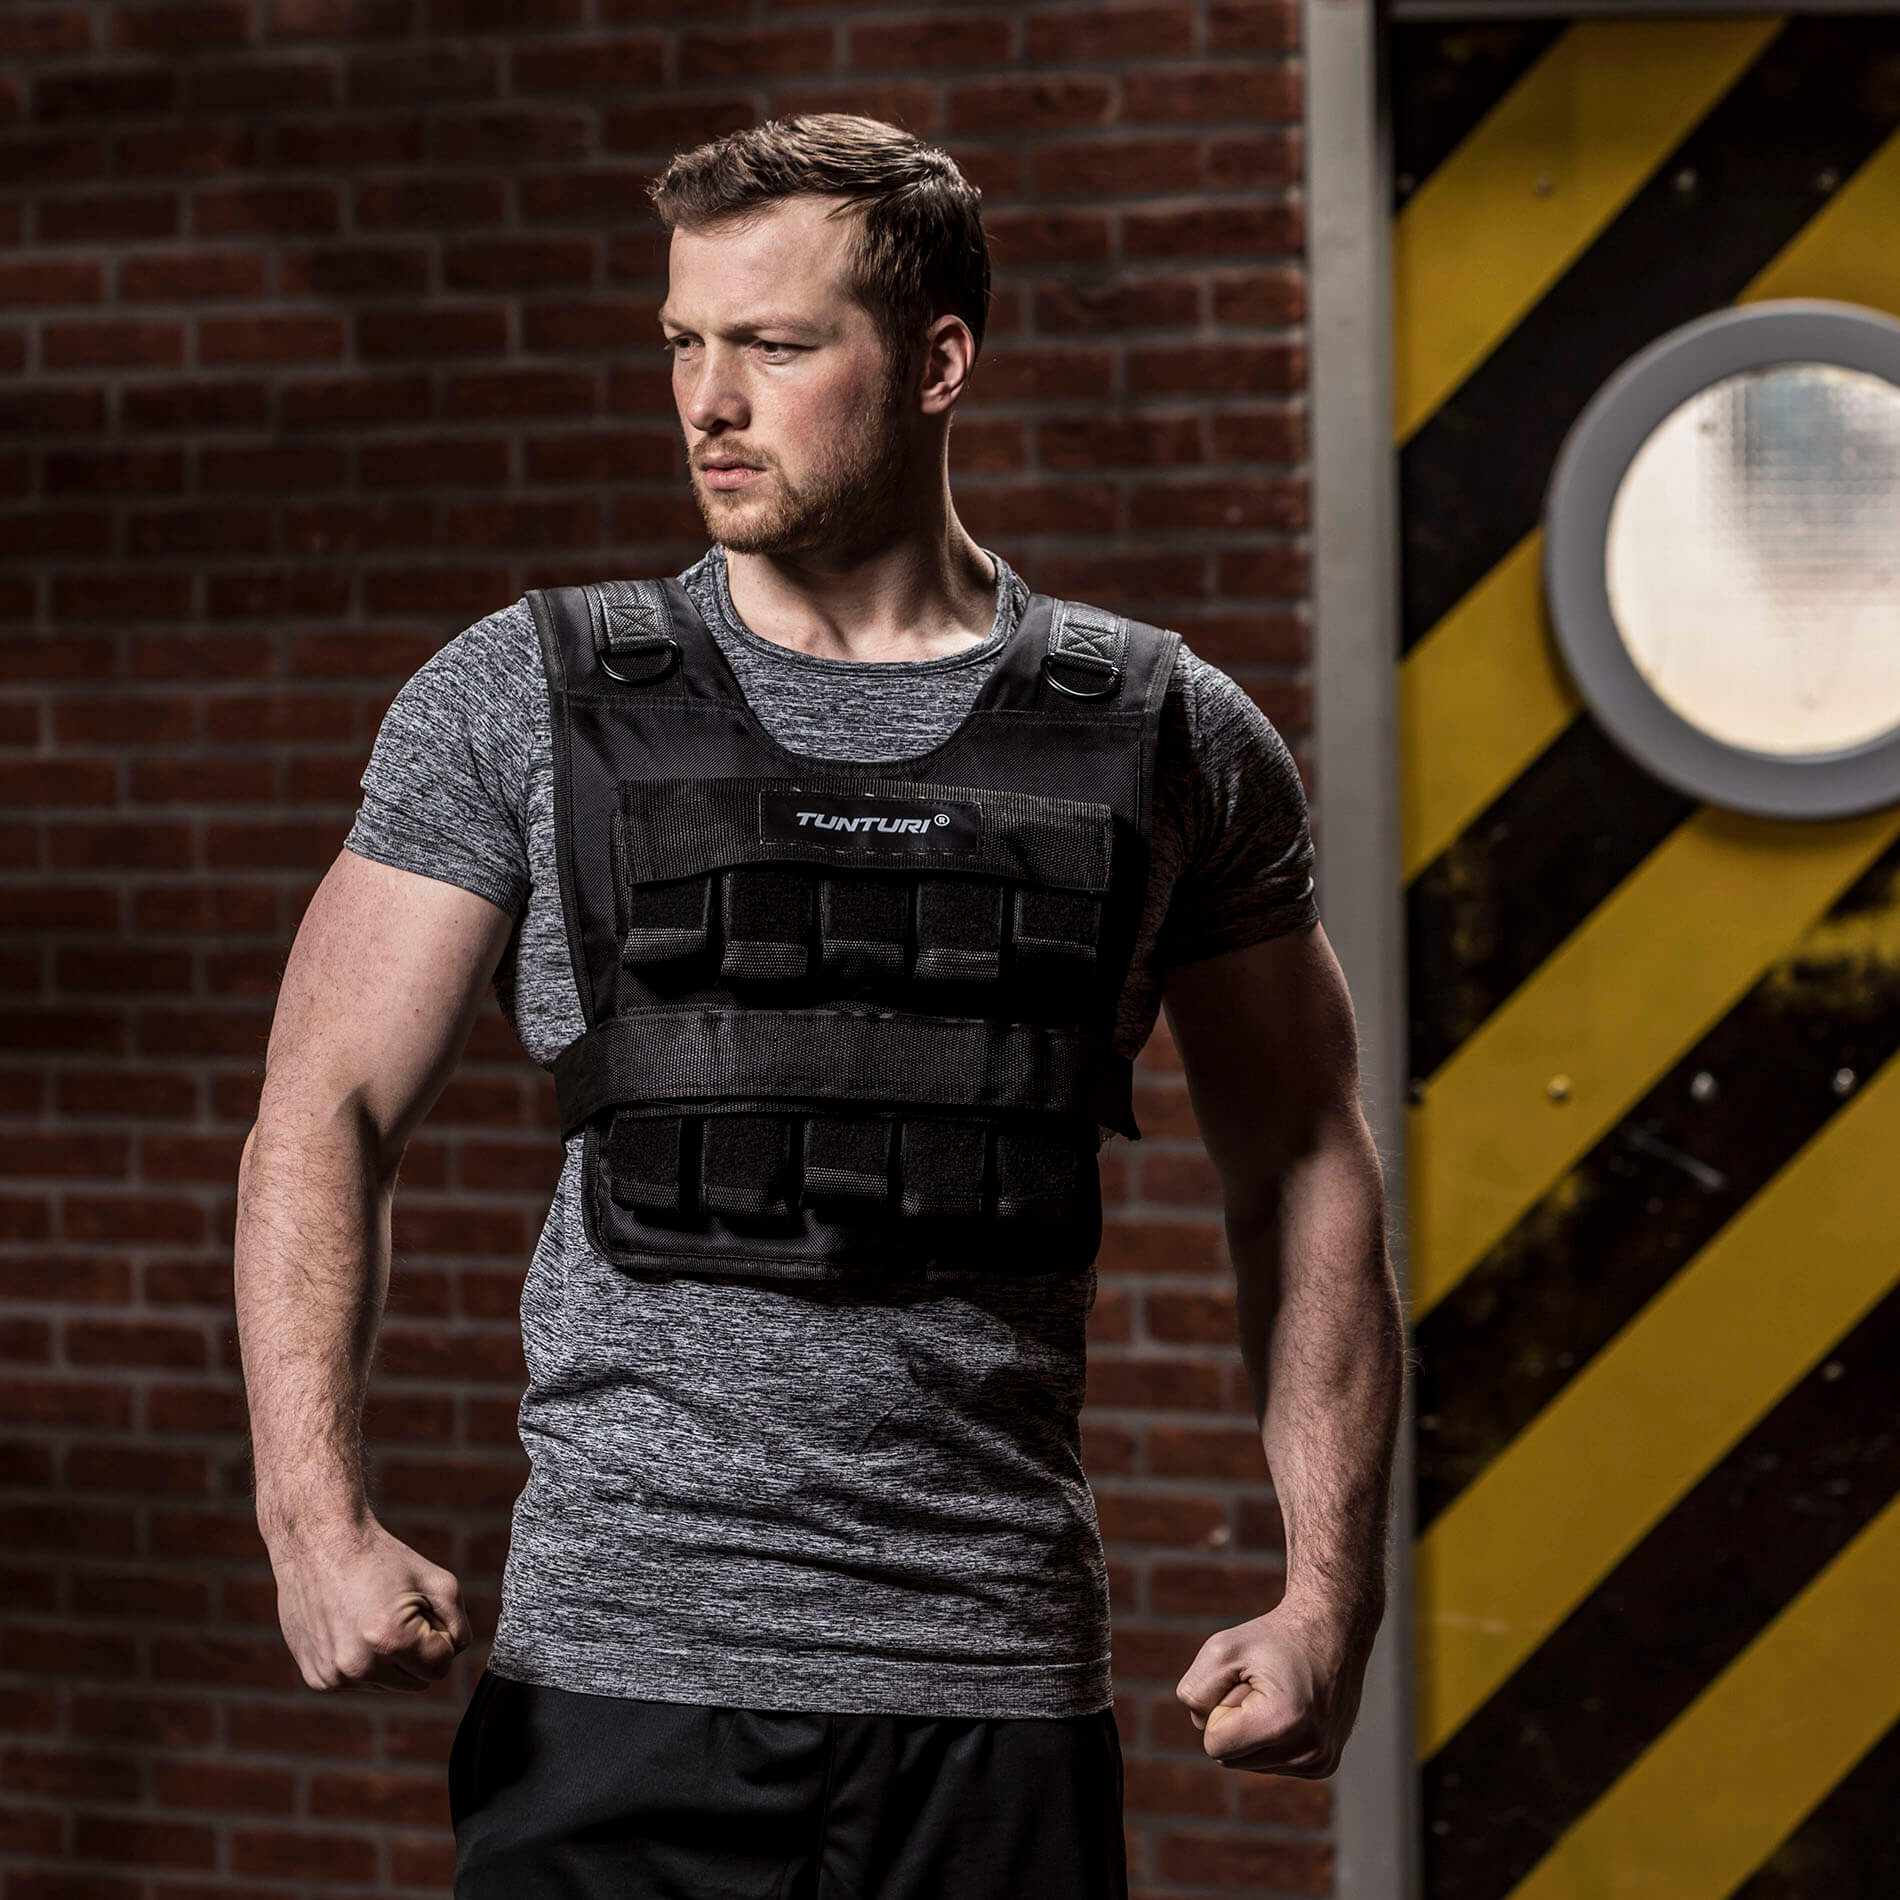 Weight Vest Pro (20 - 30kg)